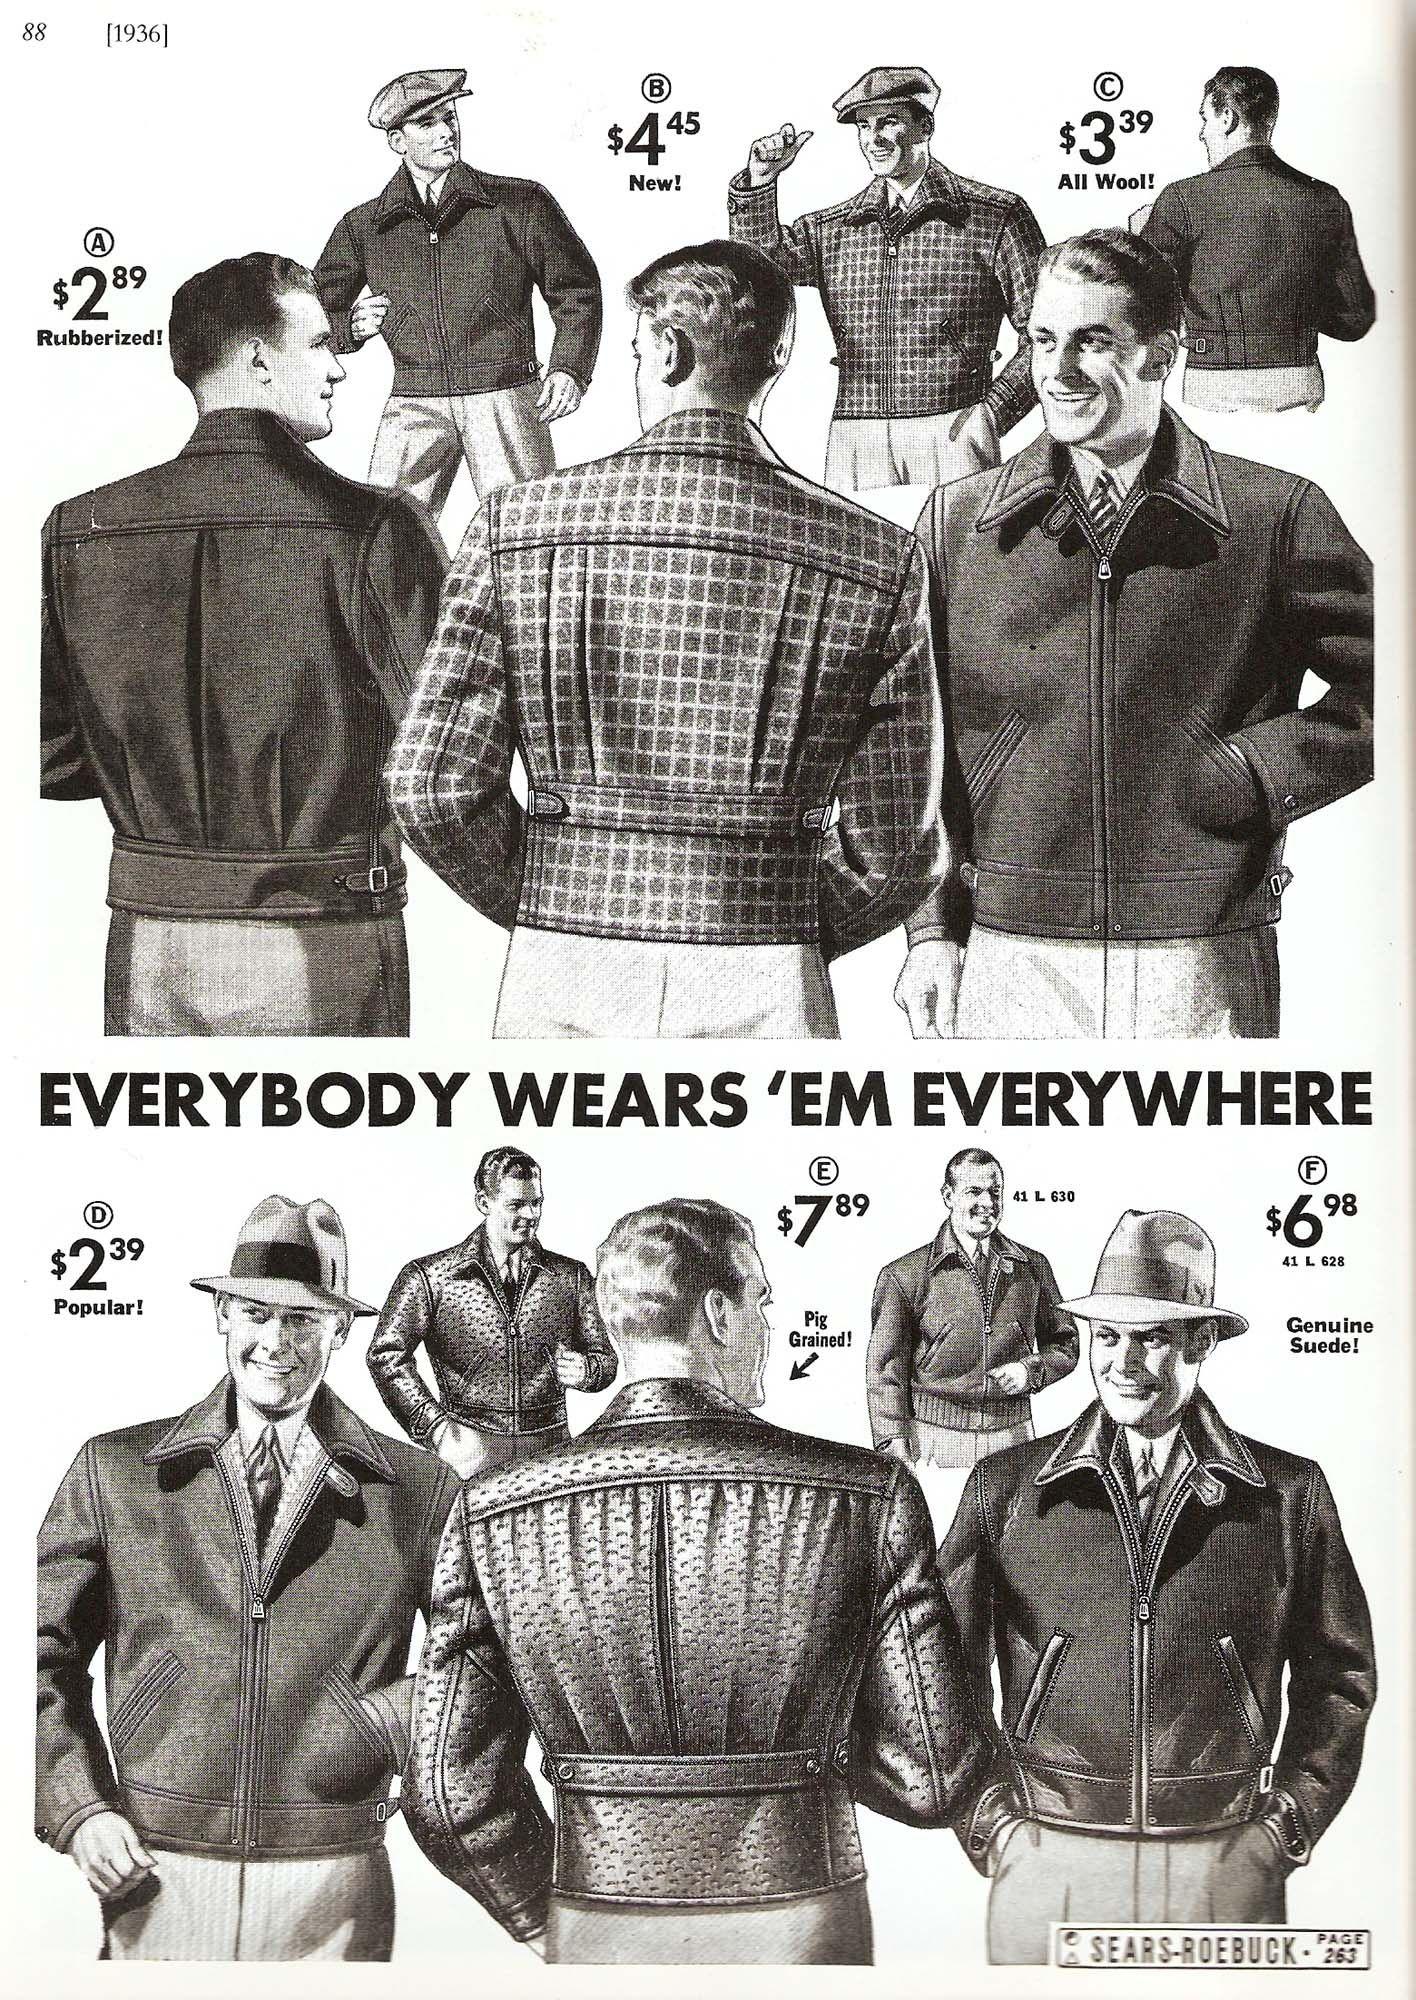 2c42290b 1936 Sears Catalog - nice details on the jackets | 30s Fashion ...